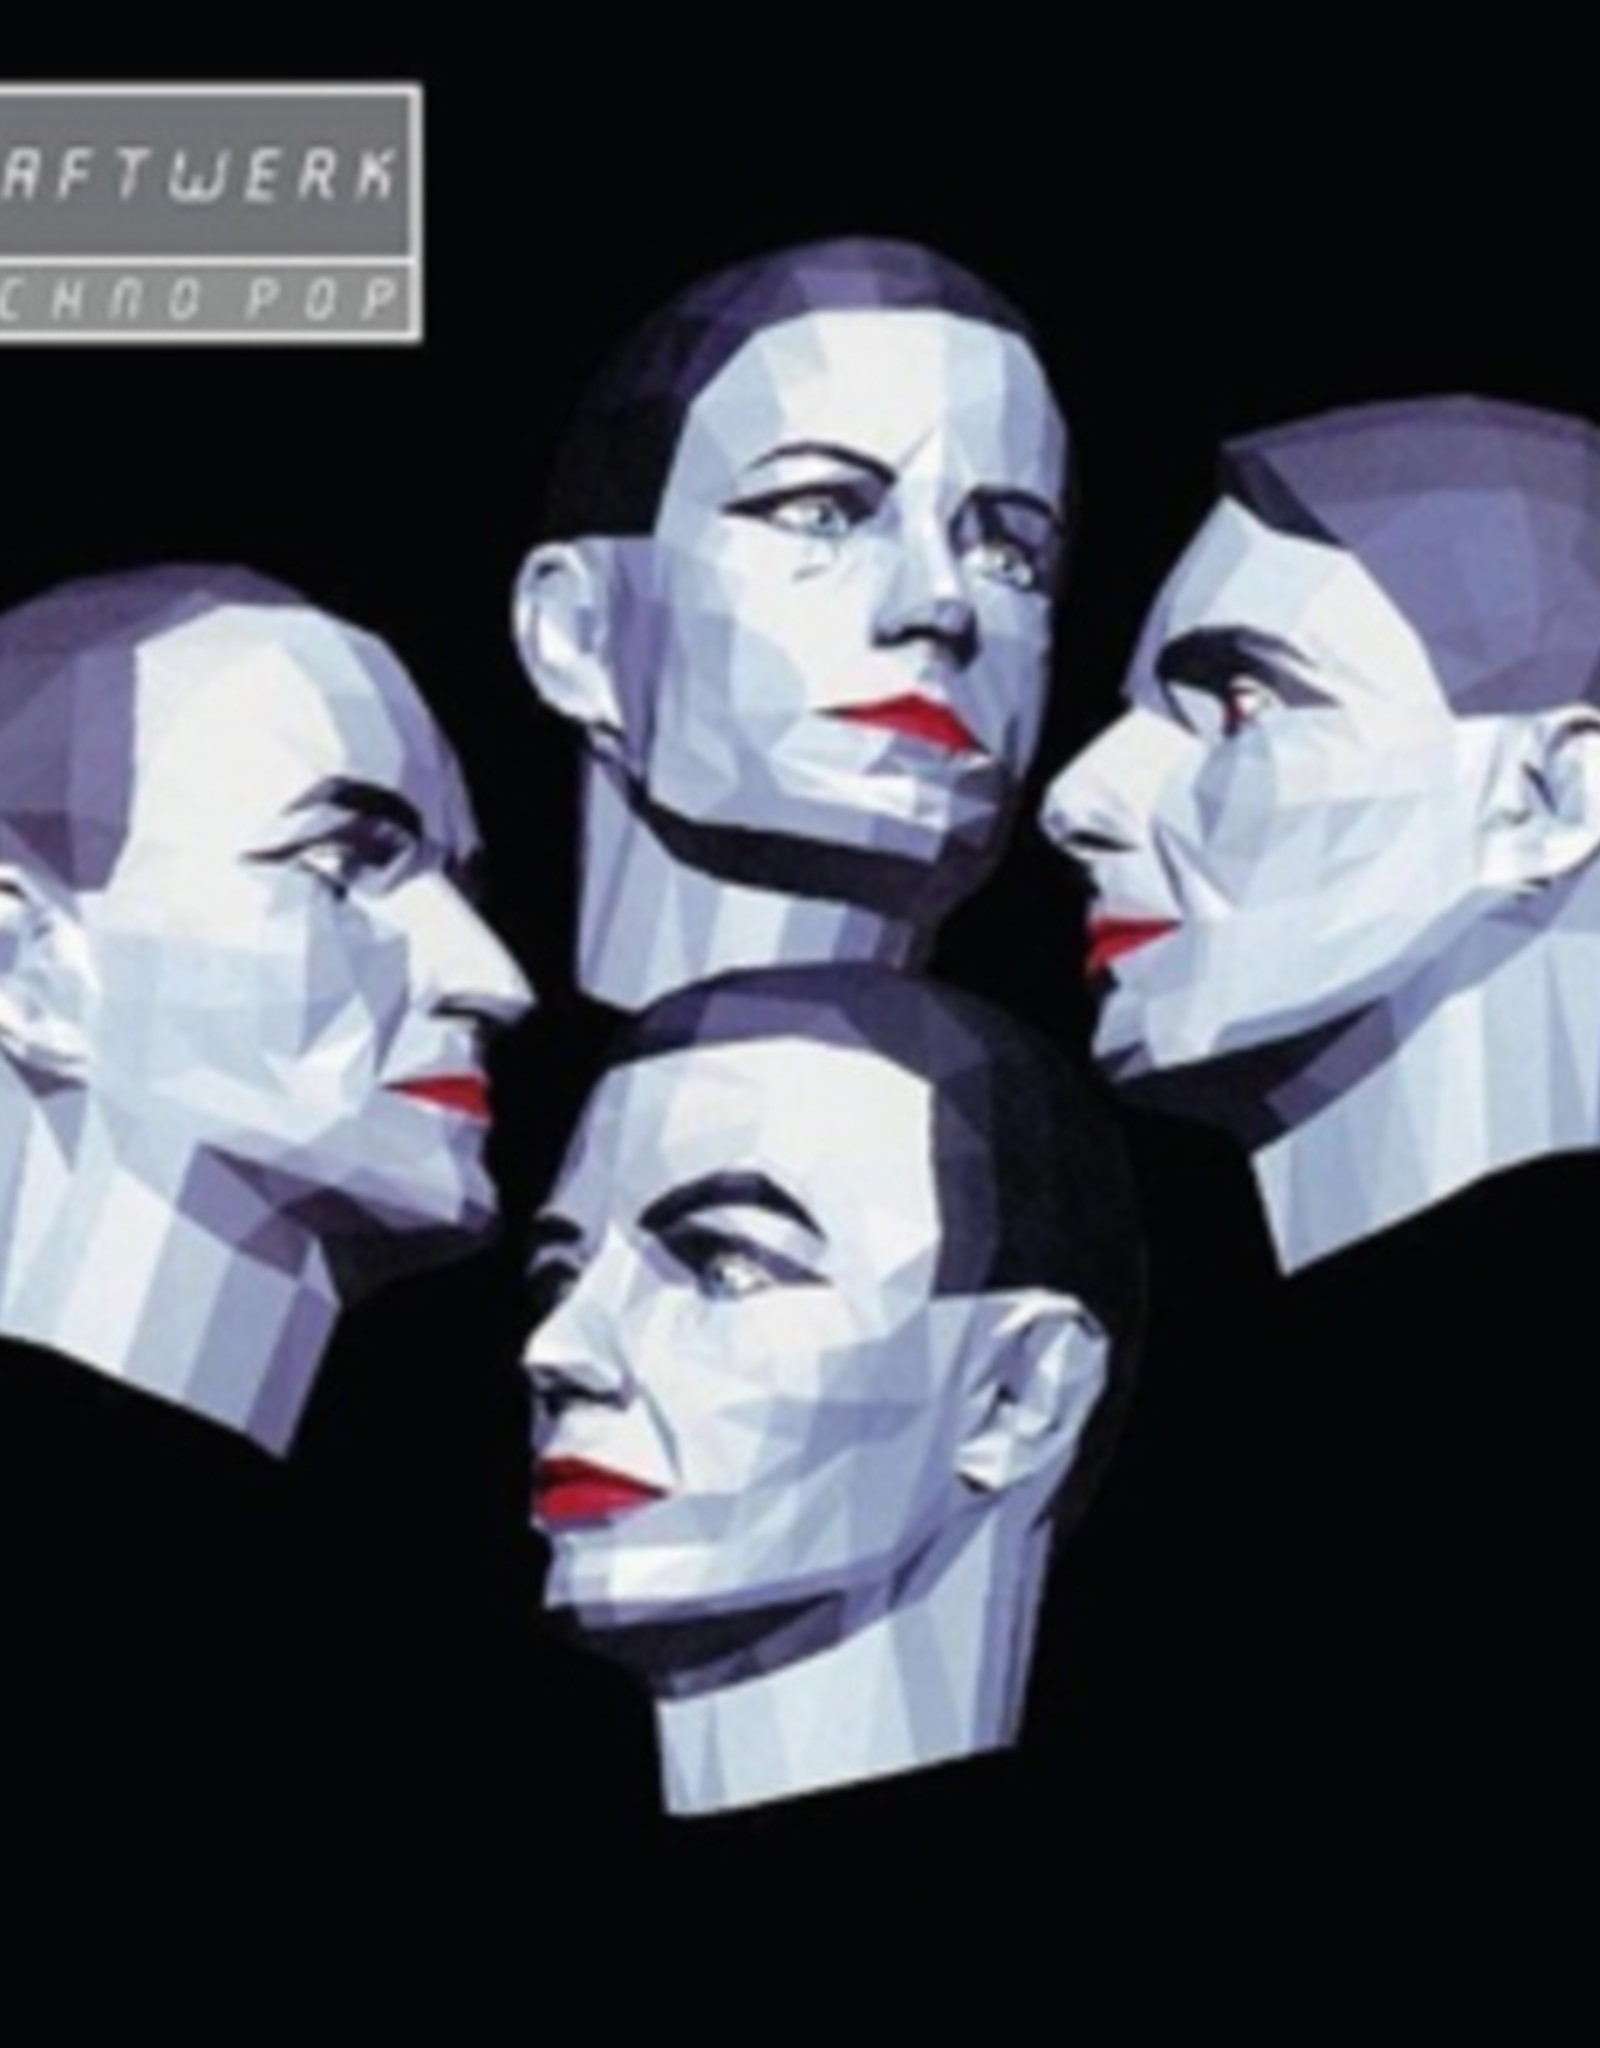 Kraftwerk - Techno Pop - color